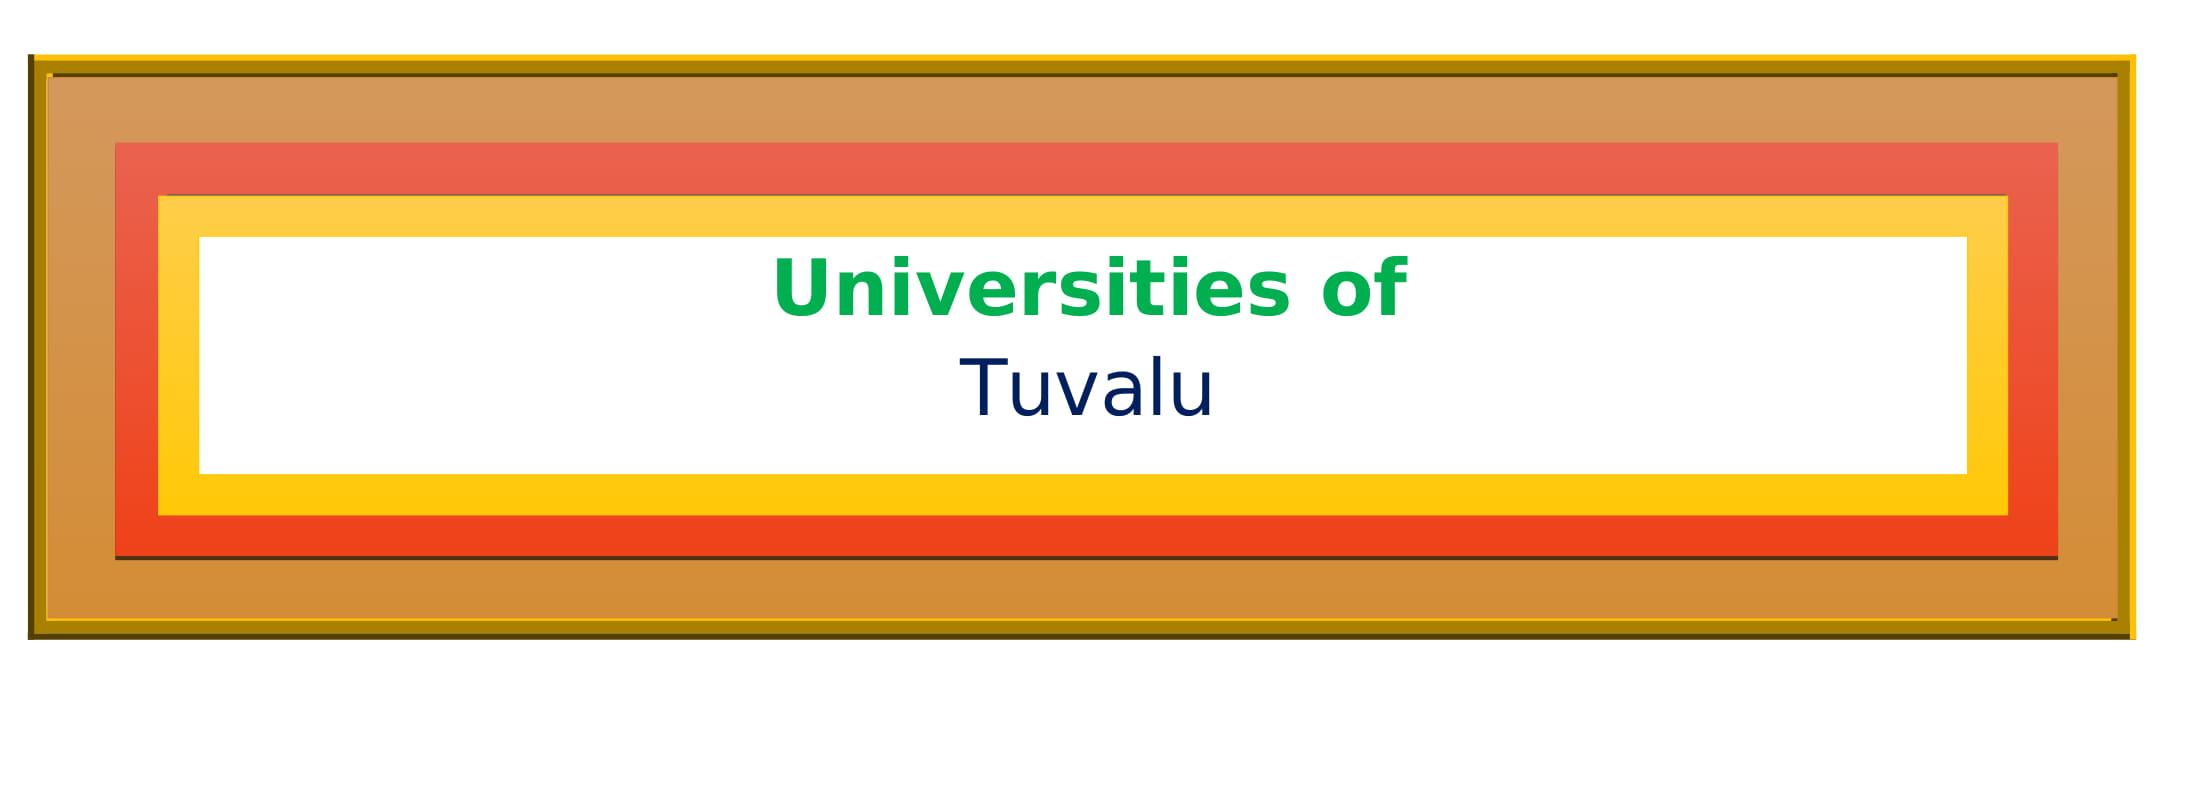 List of Universities in Tuvalu